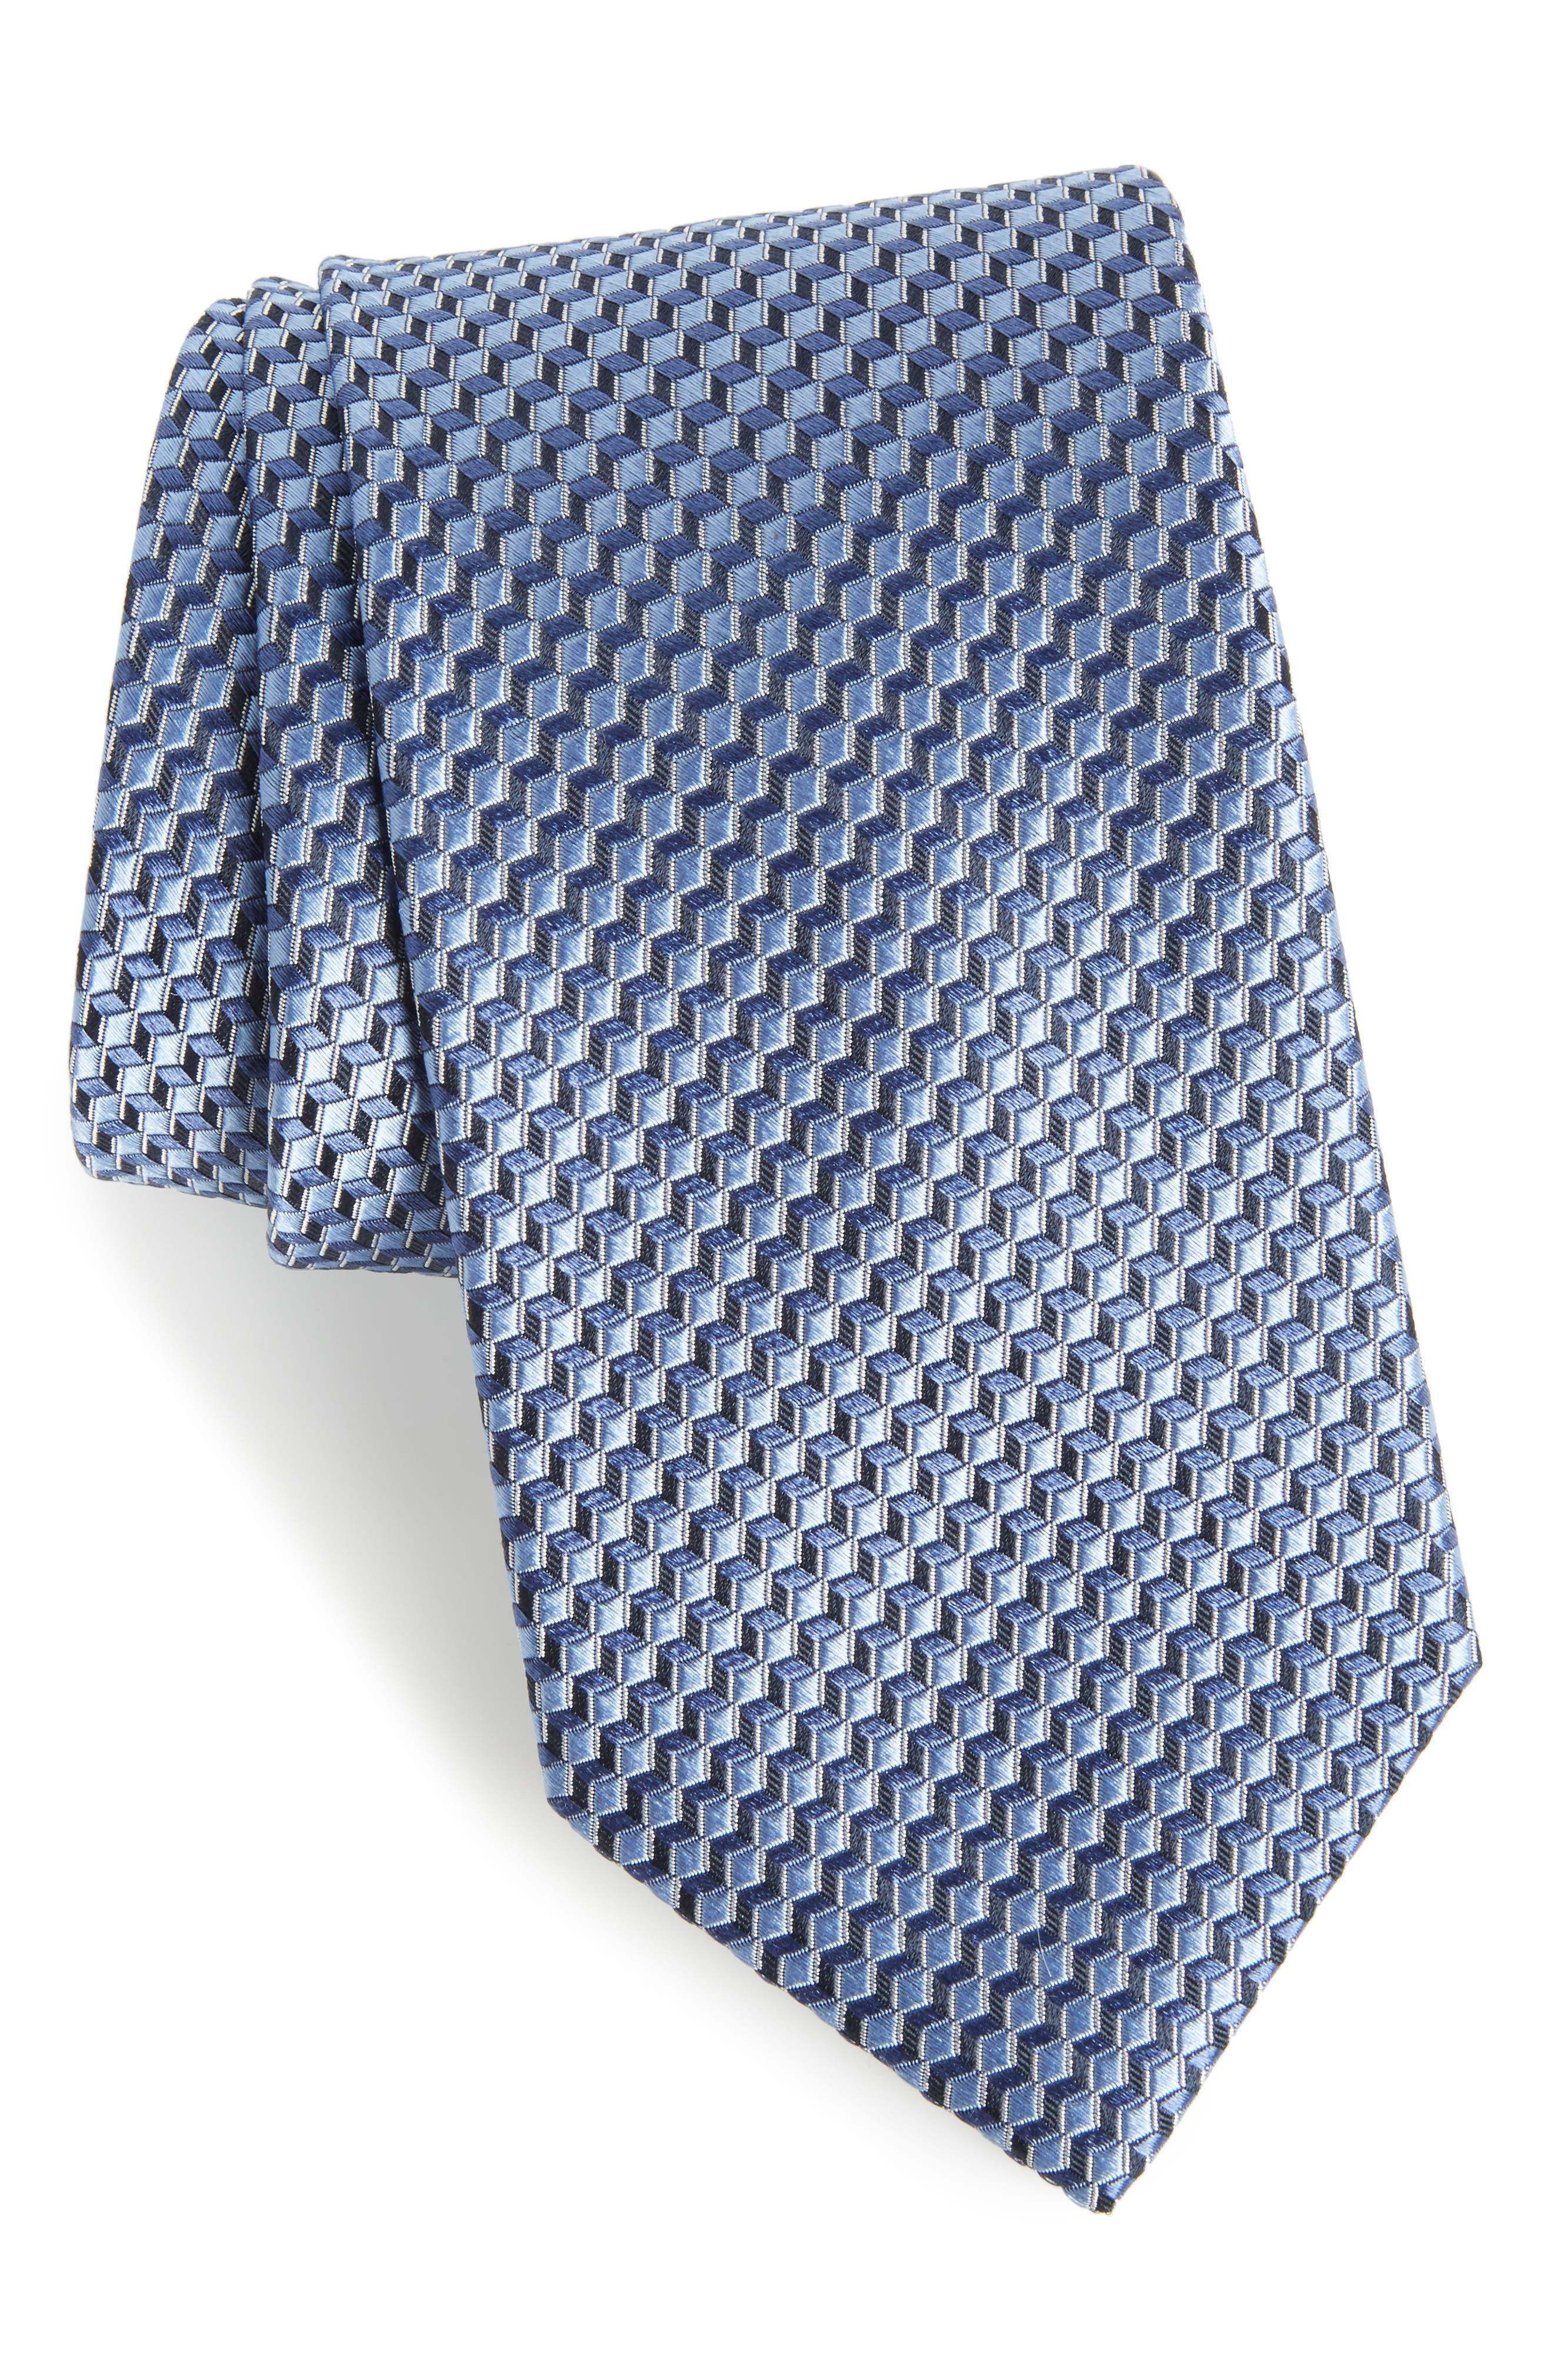 Alternate Image 1 Selected - Nordstrom Men's Shop Doria Geometric Silk Tie